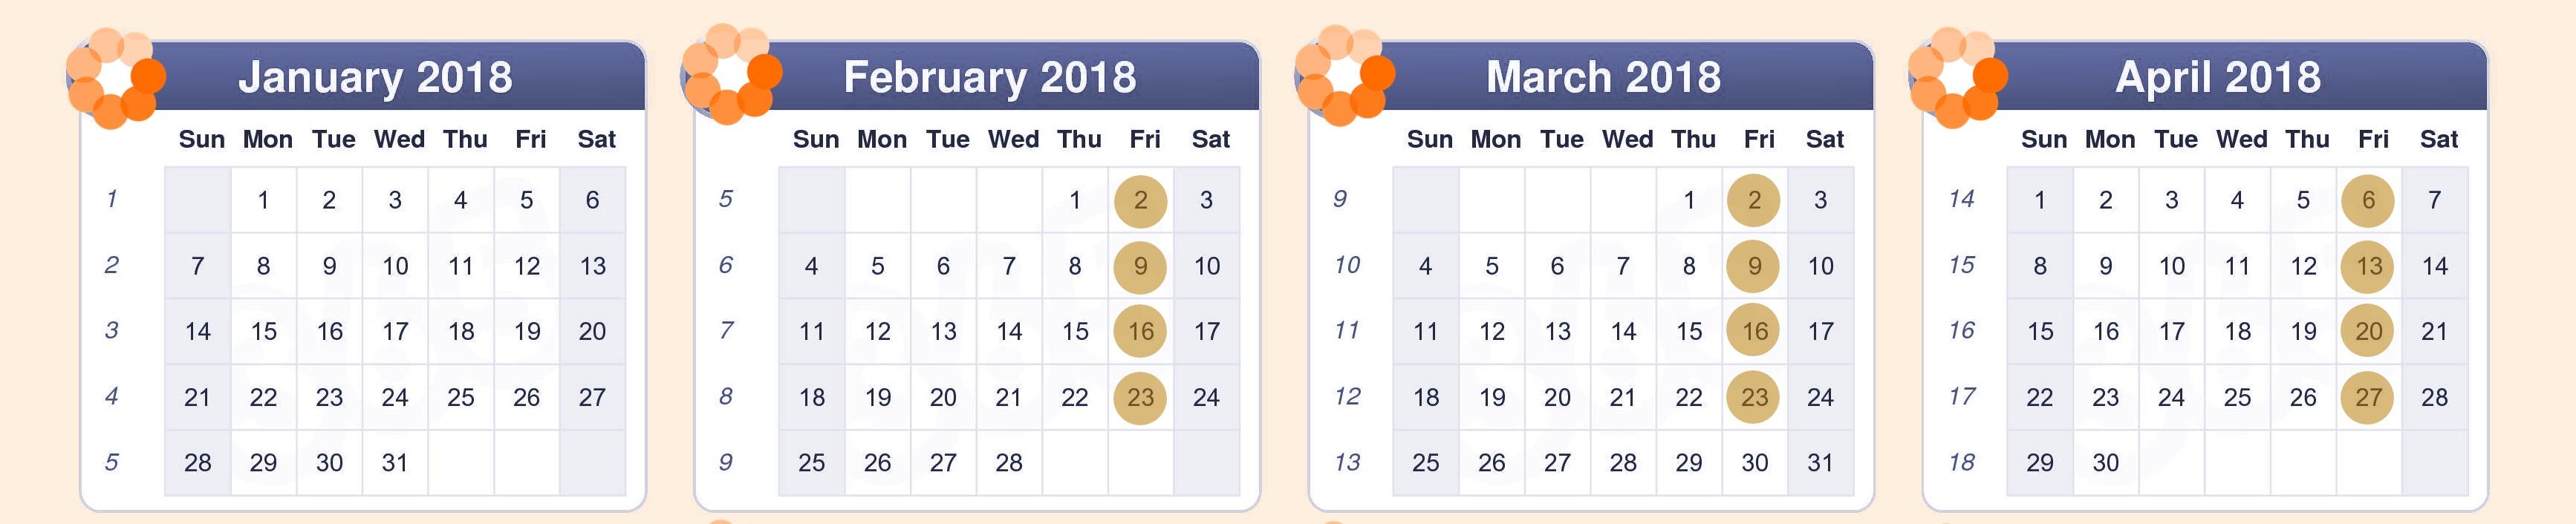 Teachers' Room Dates 2018